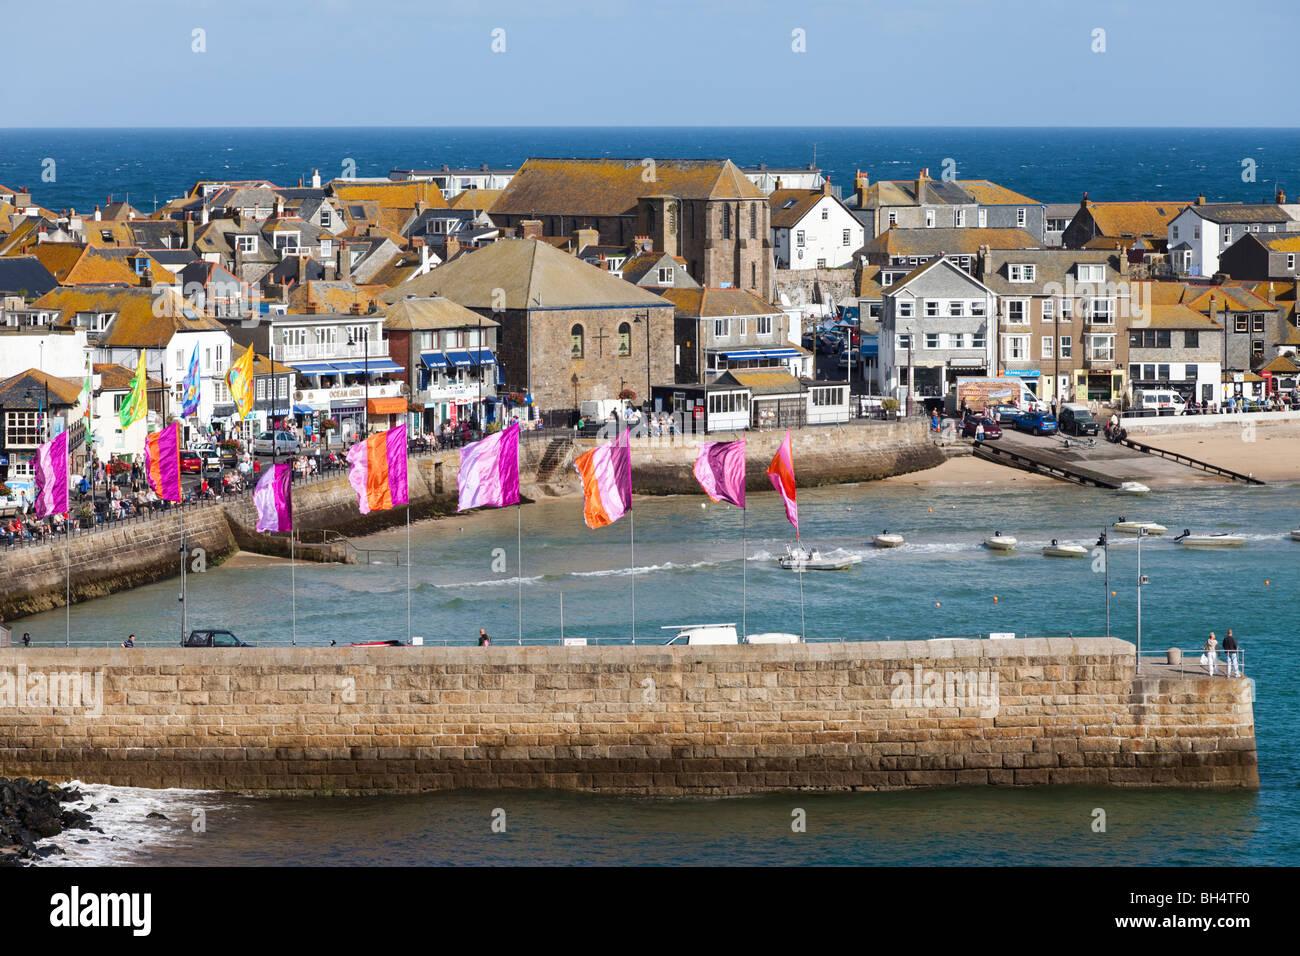 The popular seaside resort of St Ives, Cornwall Stock Photo